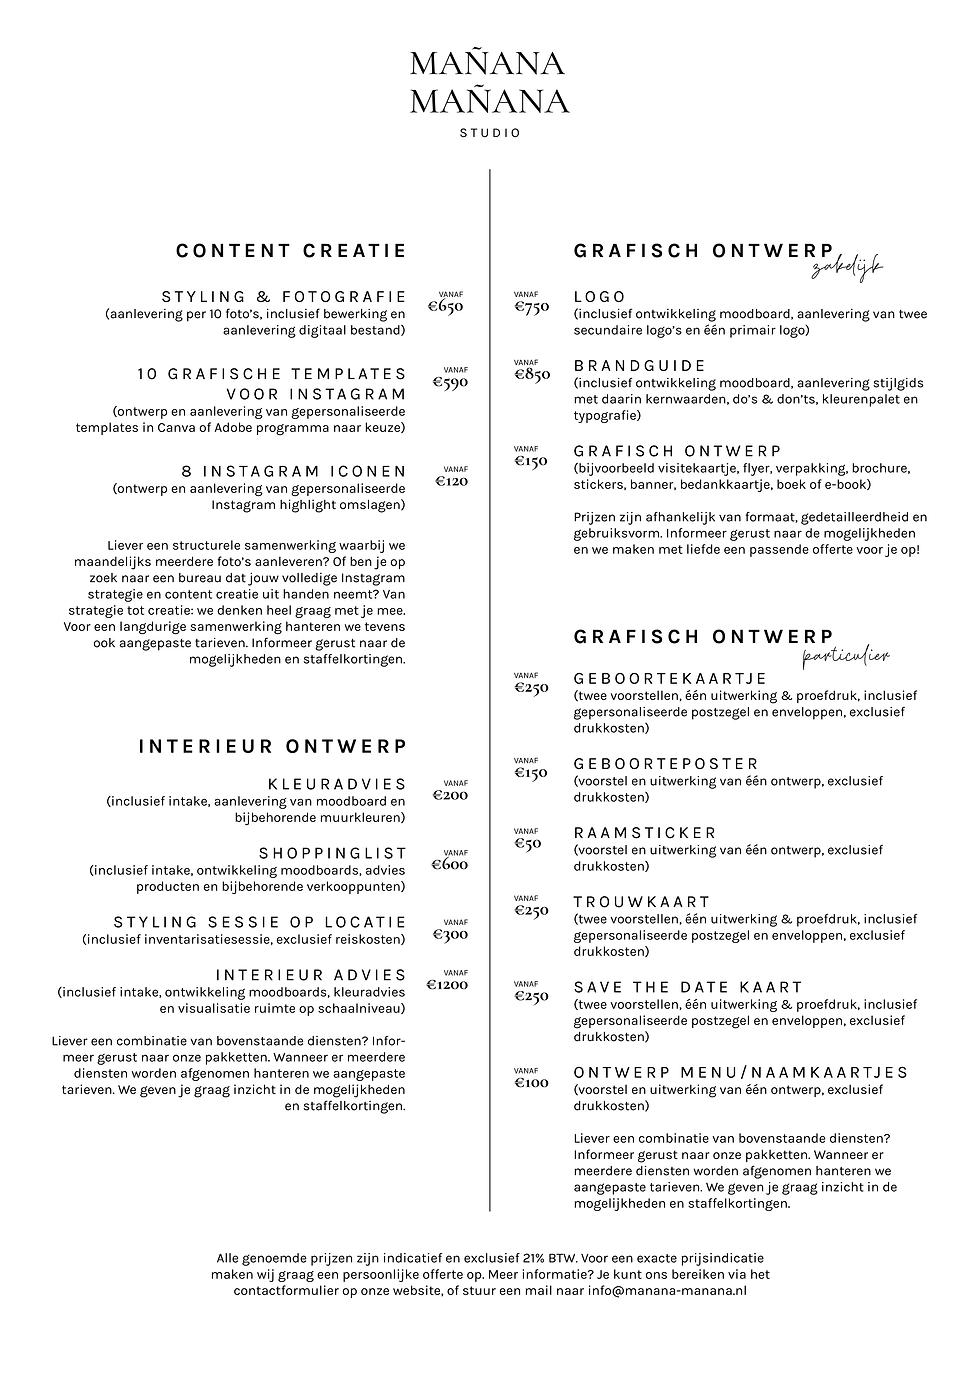 Mañana Mañana Studio tarieven website